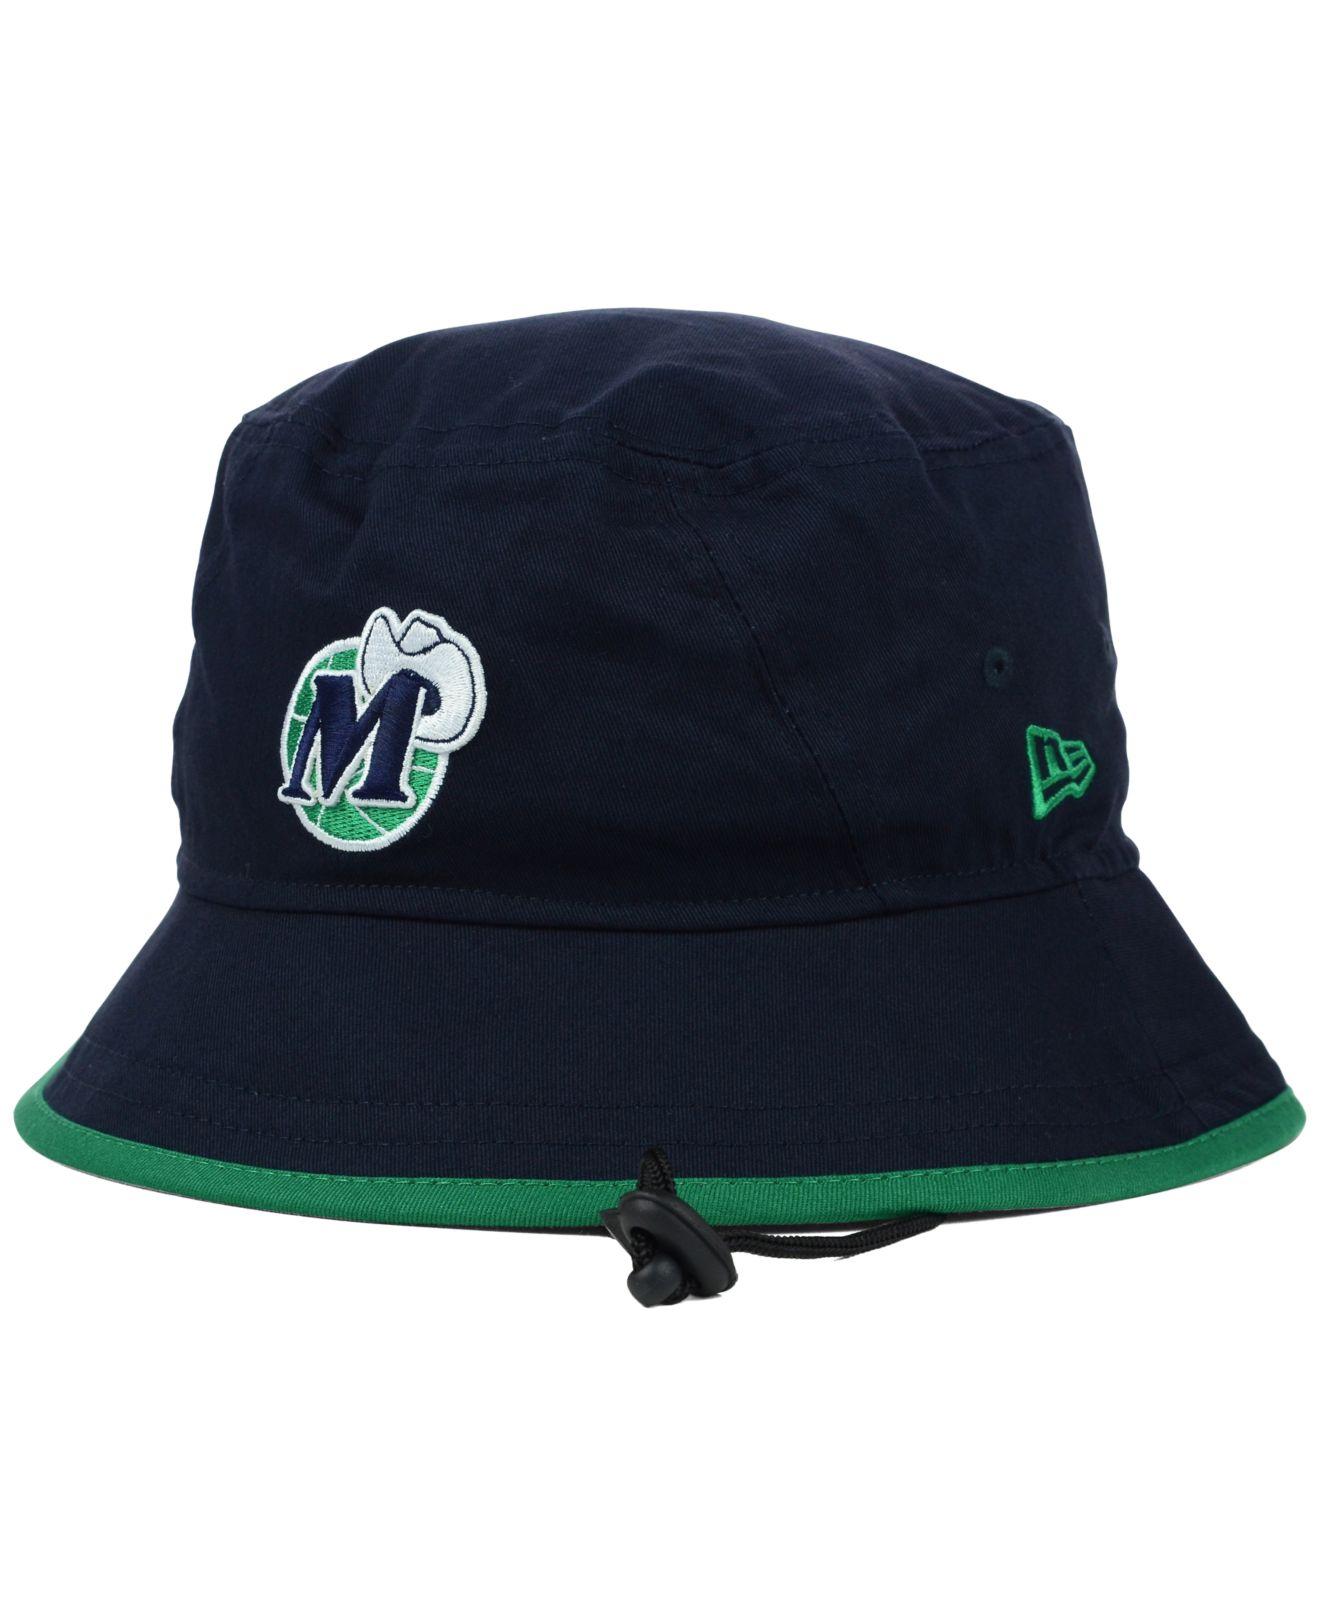 finest selection 515e4 2d7c6 KTZ Dallas Mavericks Hardwood Classics Basic Tipped Bucket Hat in ...